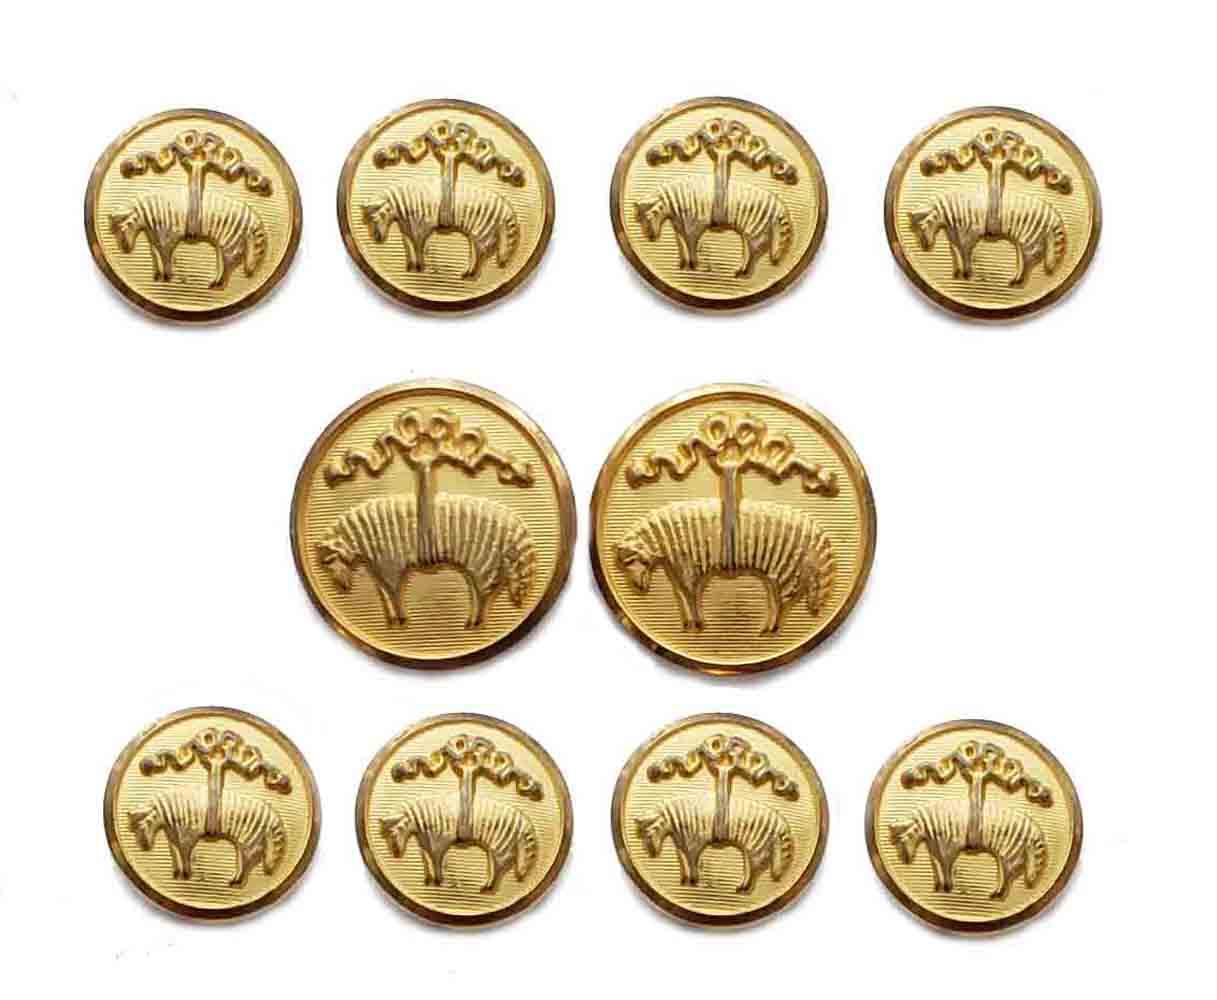 Vintage Brooks Brothers by Waterbury Blazer Buttons Set Gold Brass Golden Fleece Shank Men's